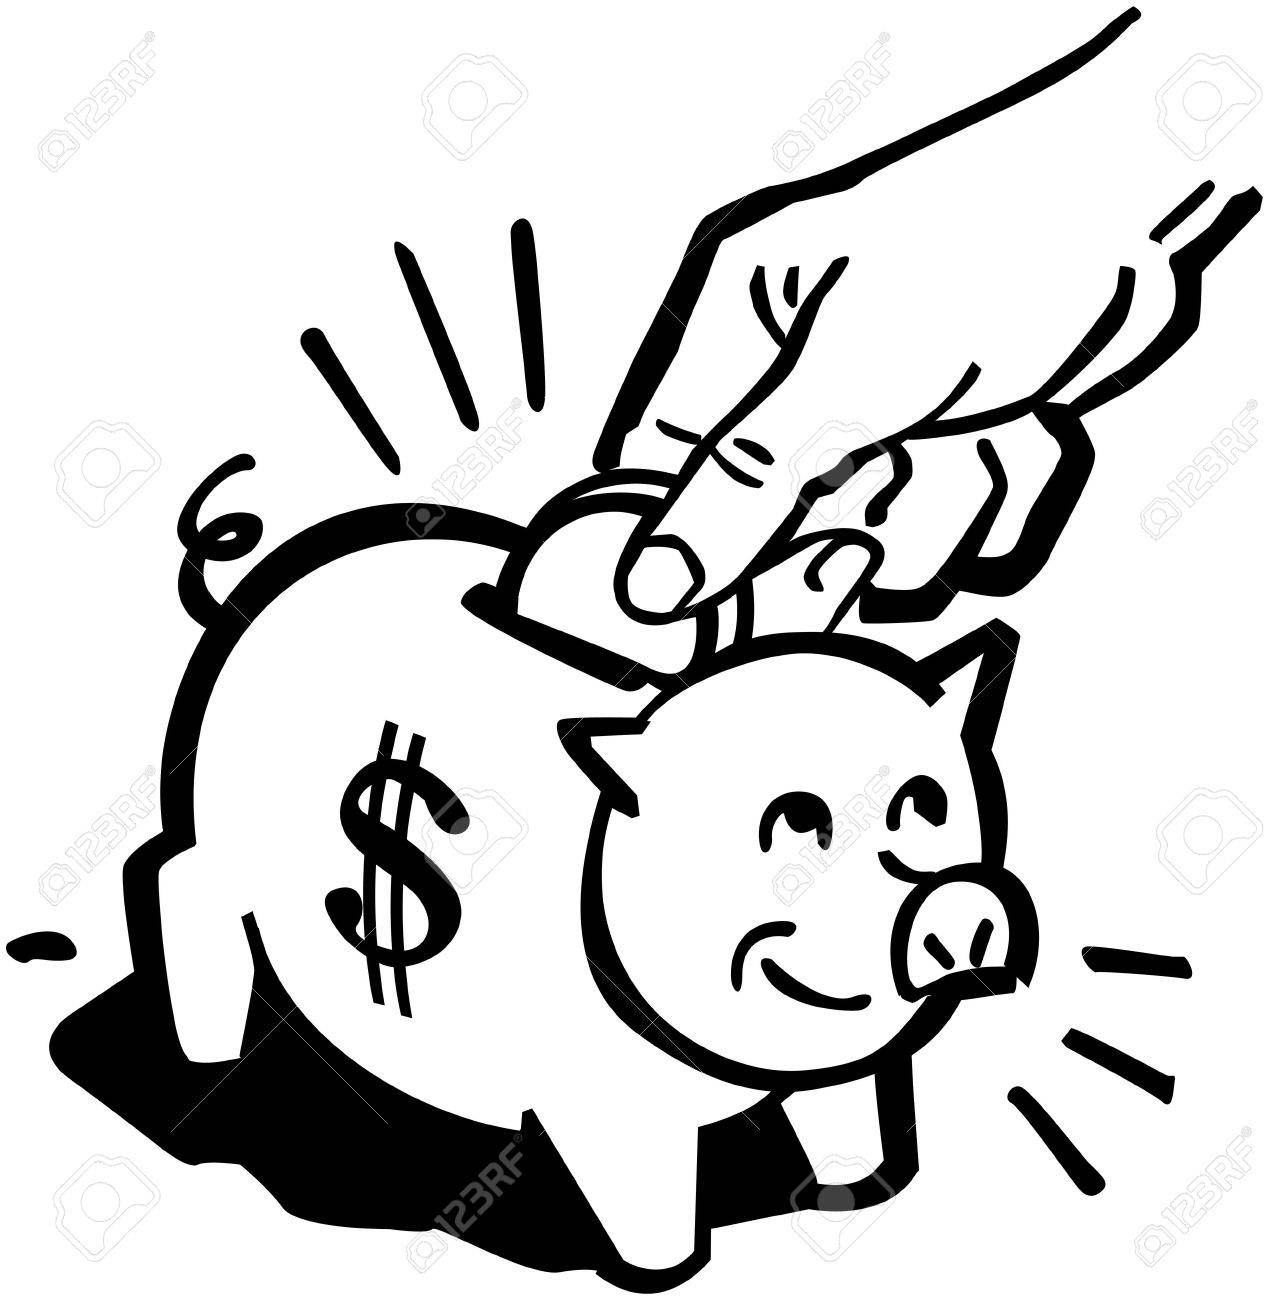 piggy bank royalty free cliparts vectors and stock illustration rh 123rf com piggy bank clipart pink broken piggy bank clipart